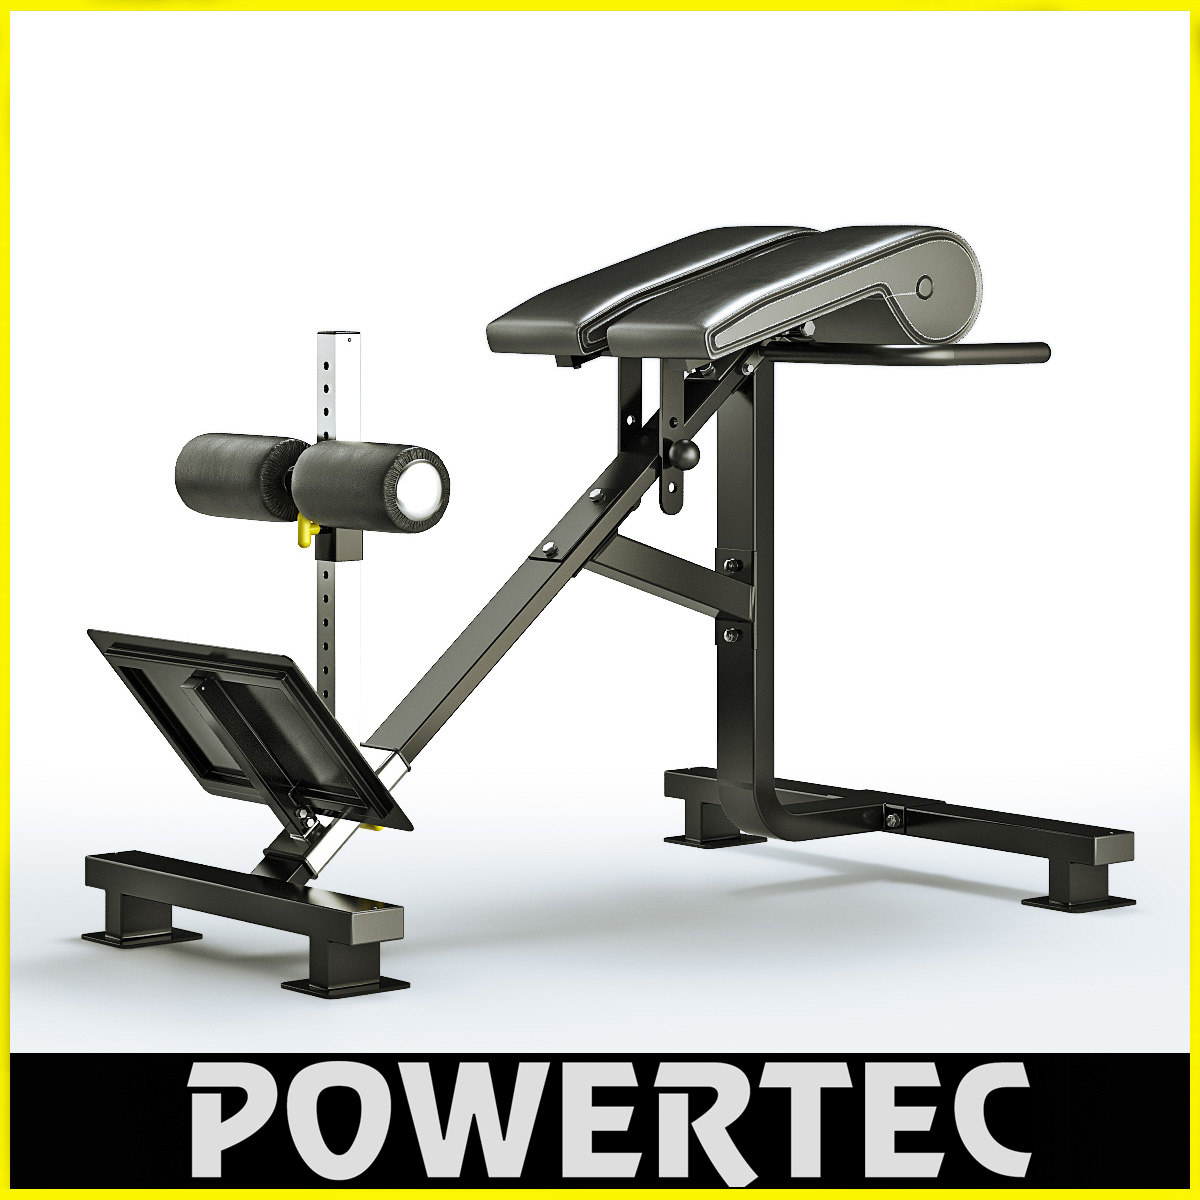 Powertec_P-HC10_01.jpg